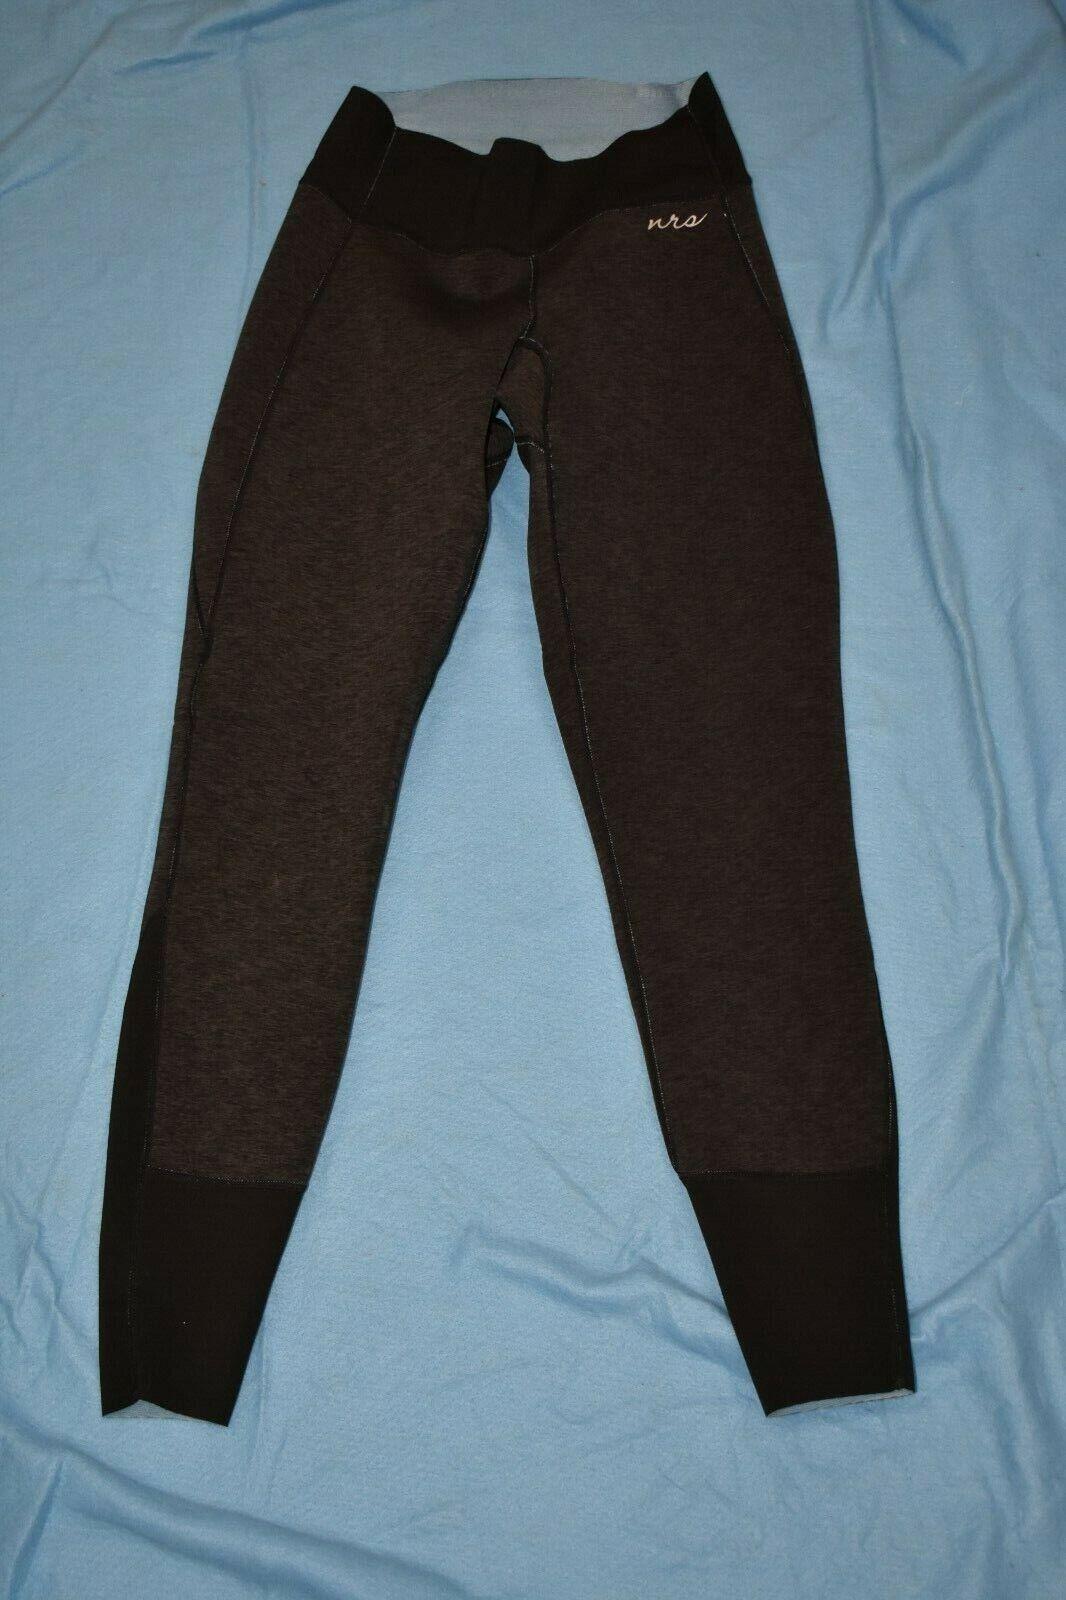 NRS Hyrdoskin  1.5mm Pants Womens  100% price guarantee